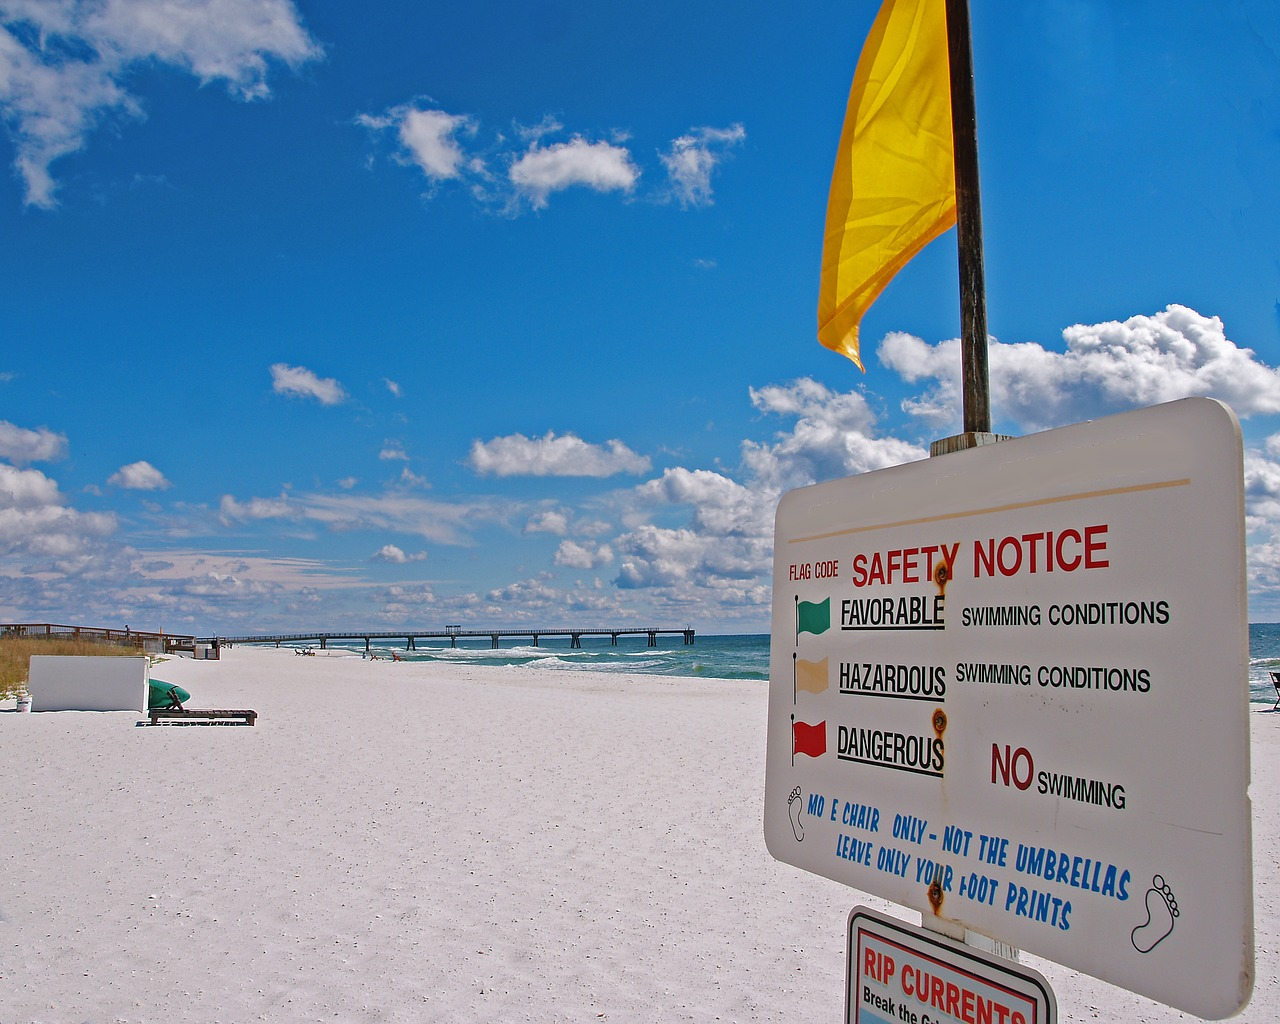 USA Destin Beach